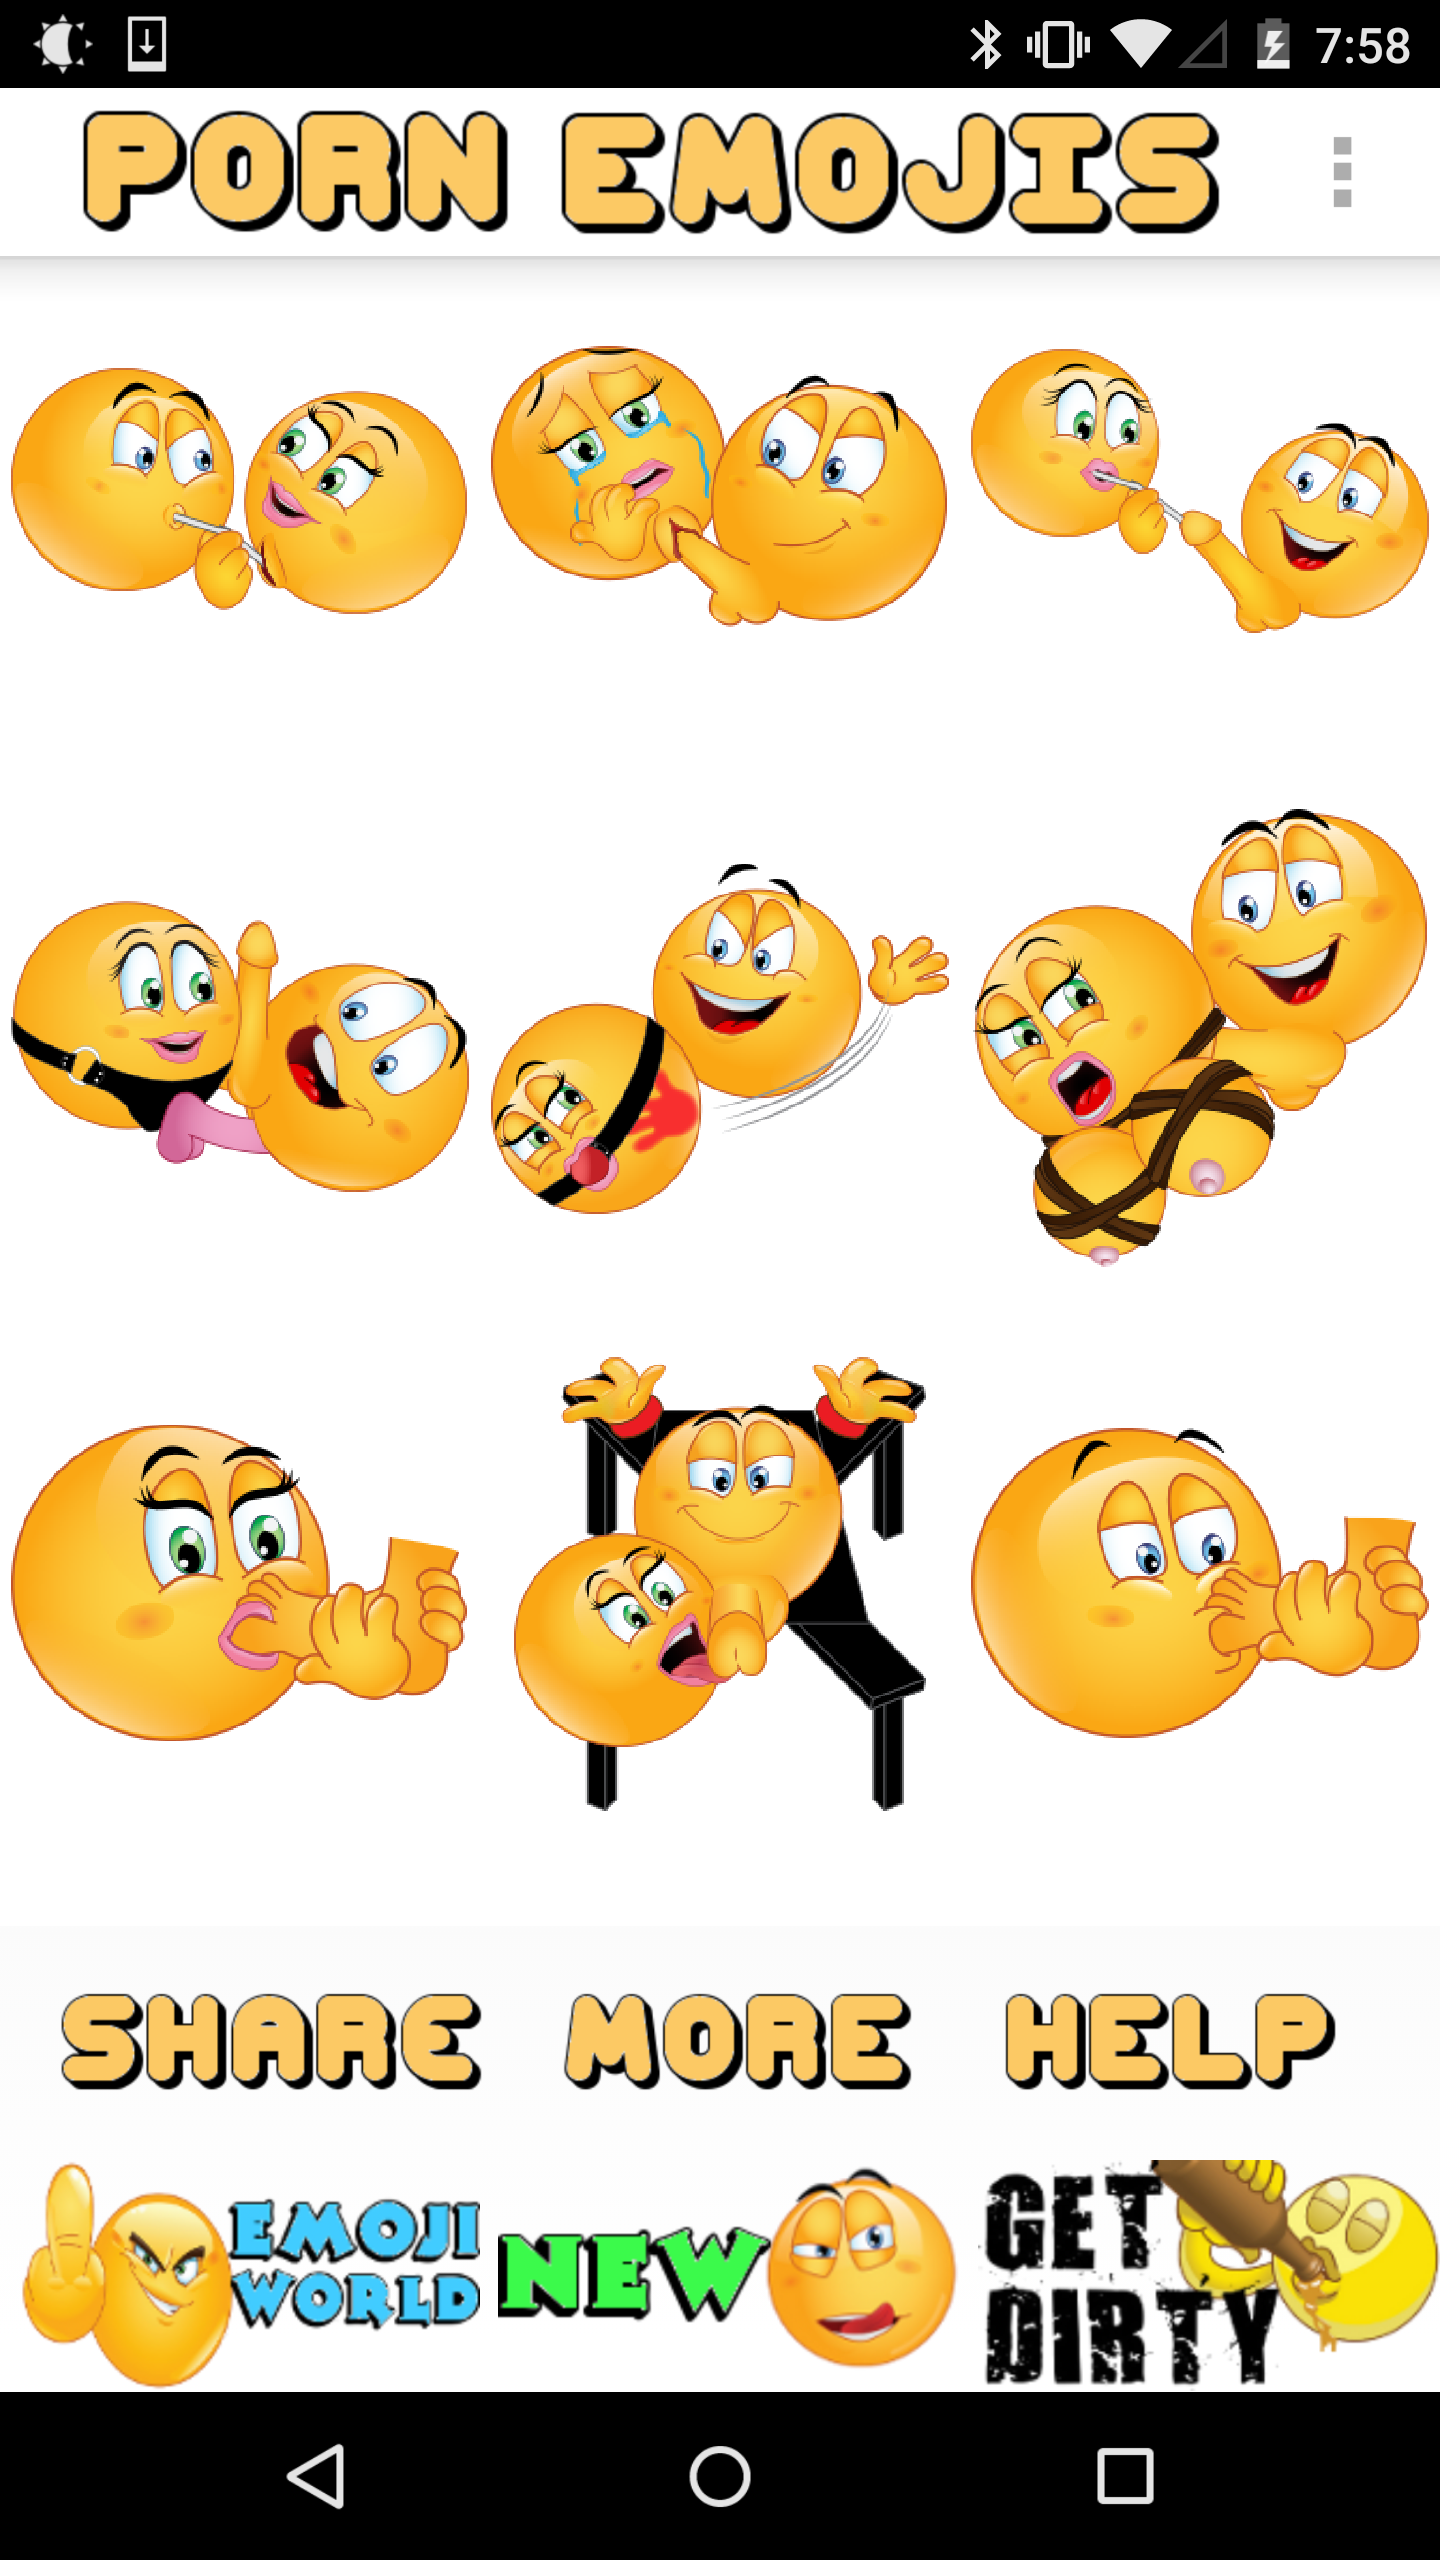 Download gif: Porn emoji download android